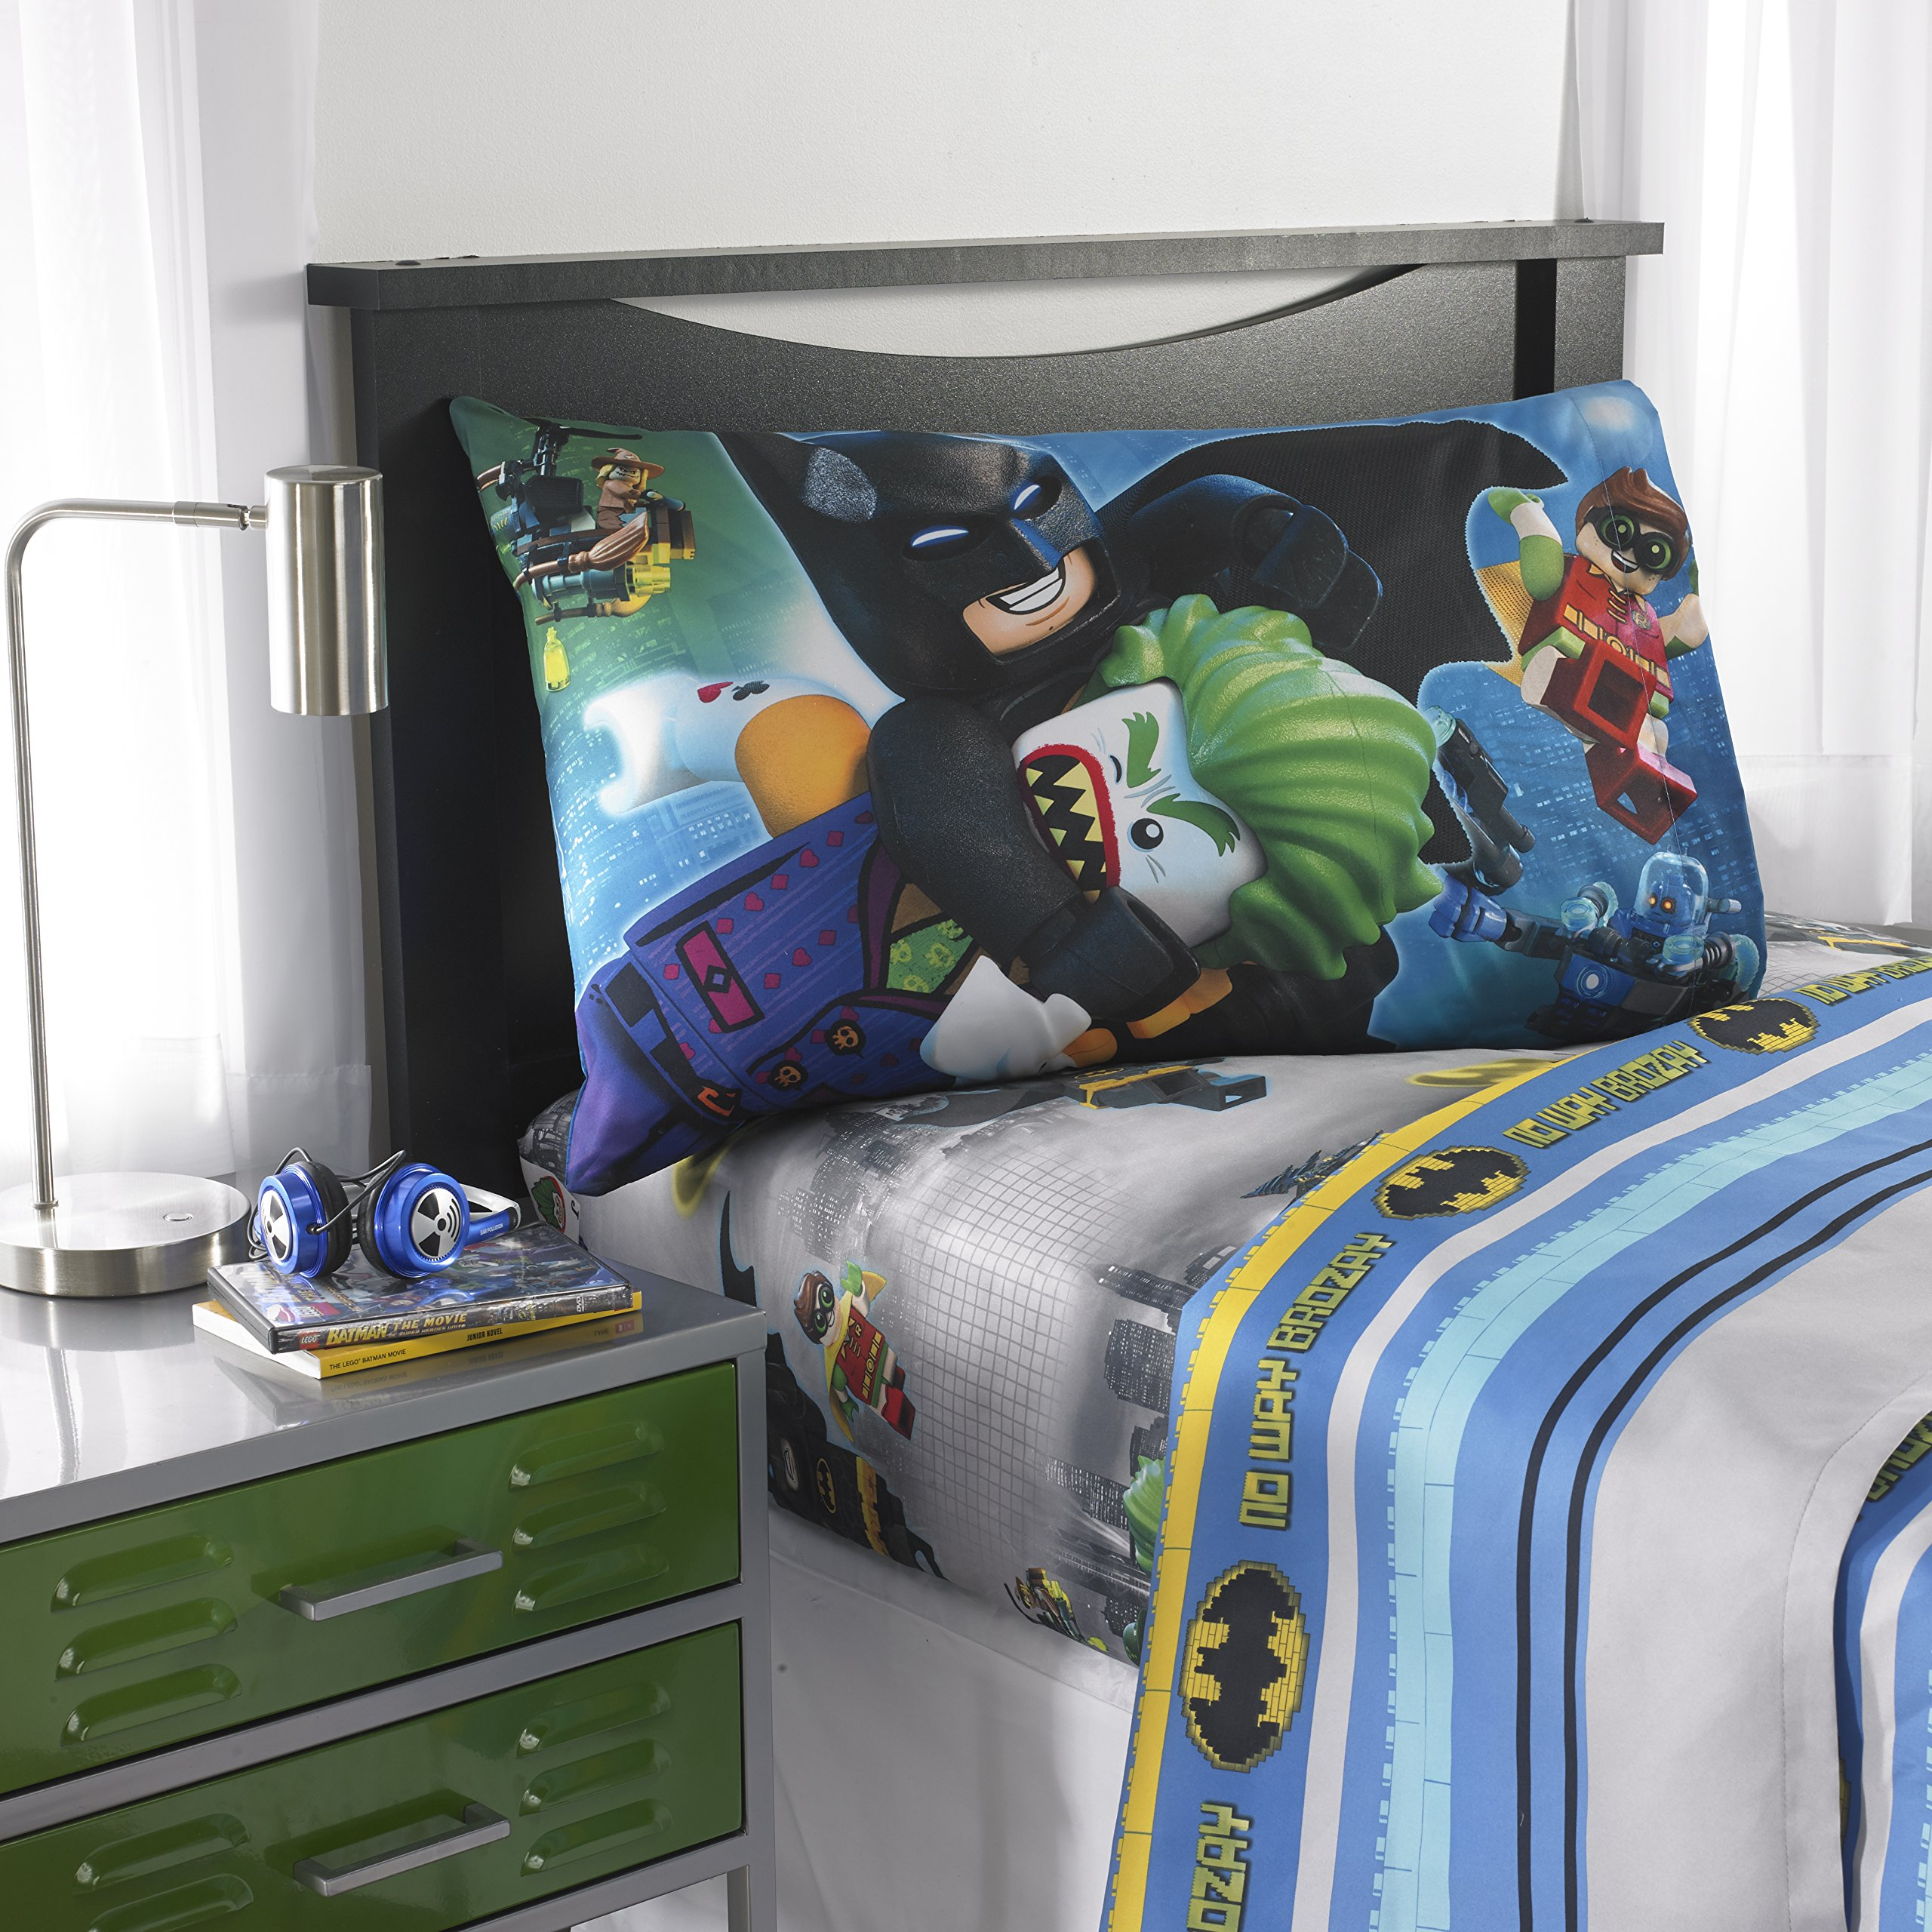 LEGO Batman Movie Microfiber Sheet Set with Pillow Cases - Full